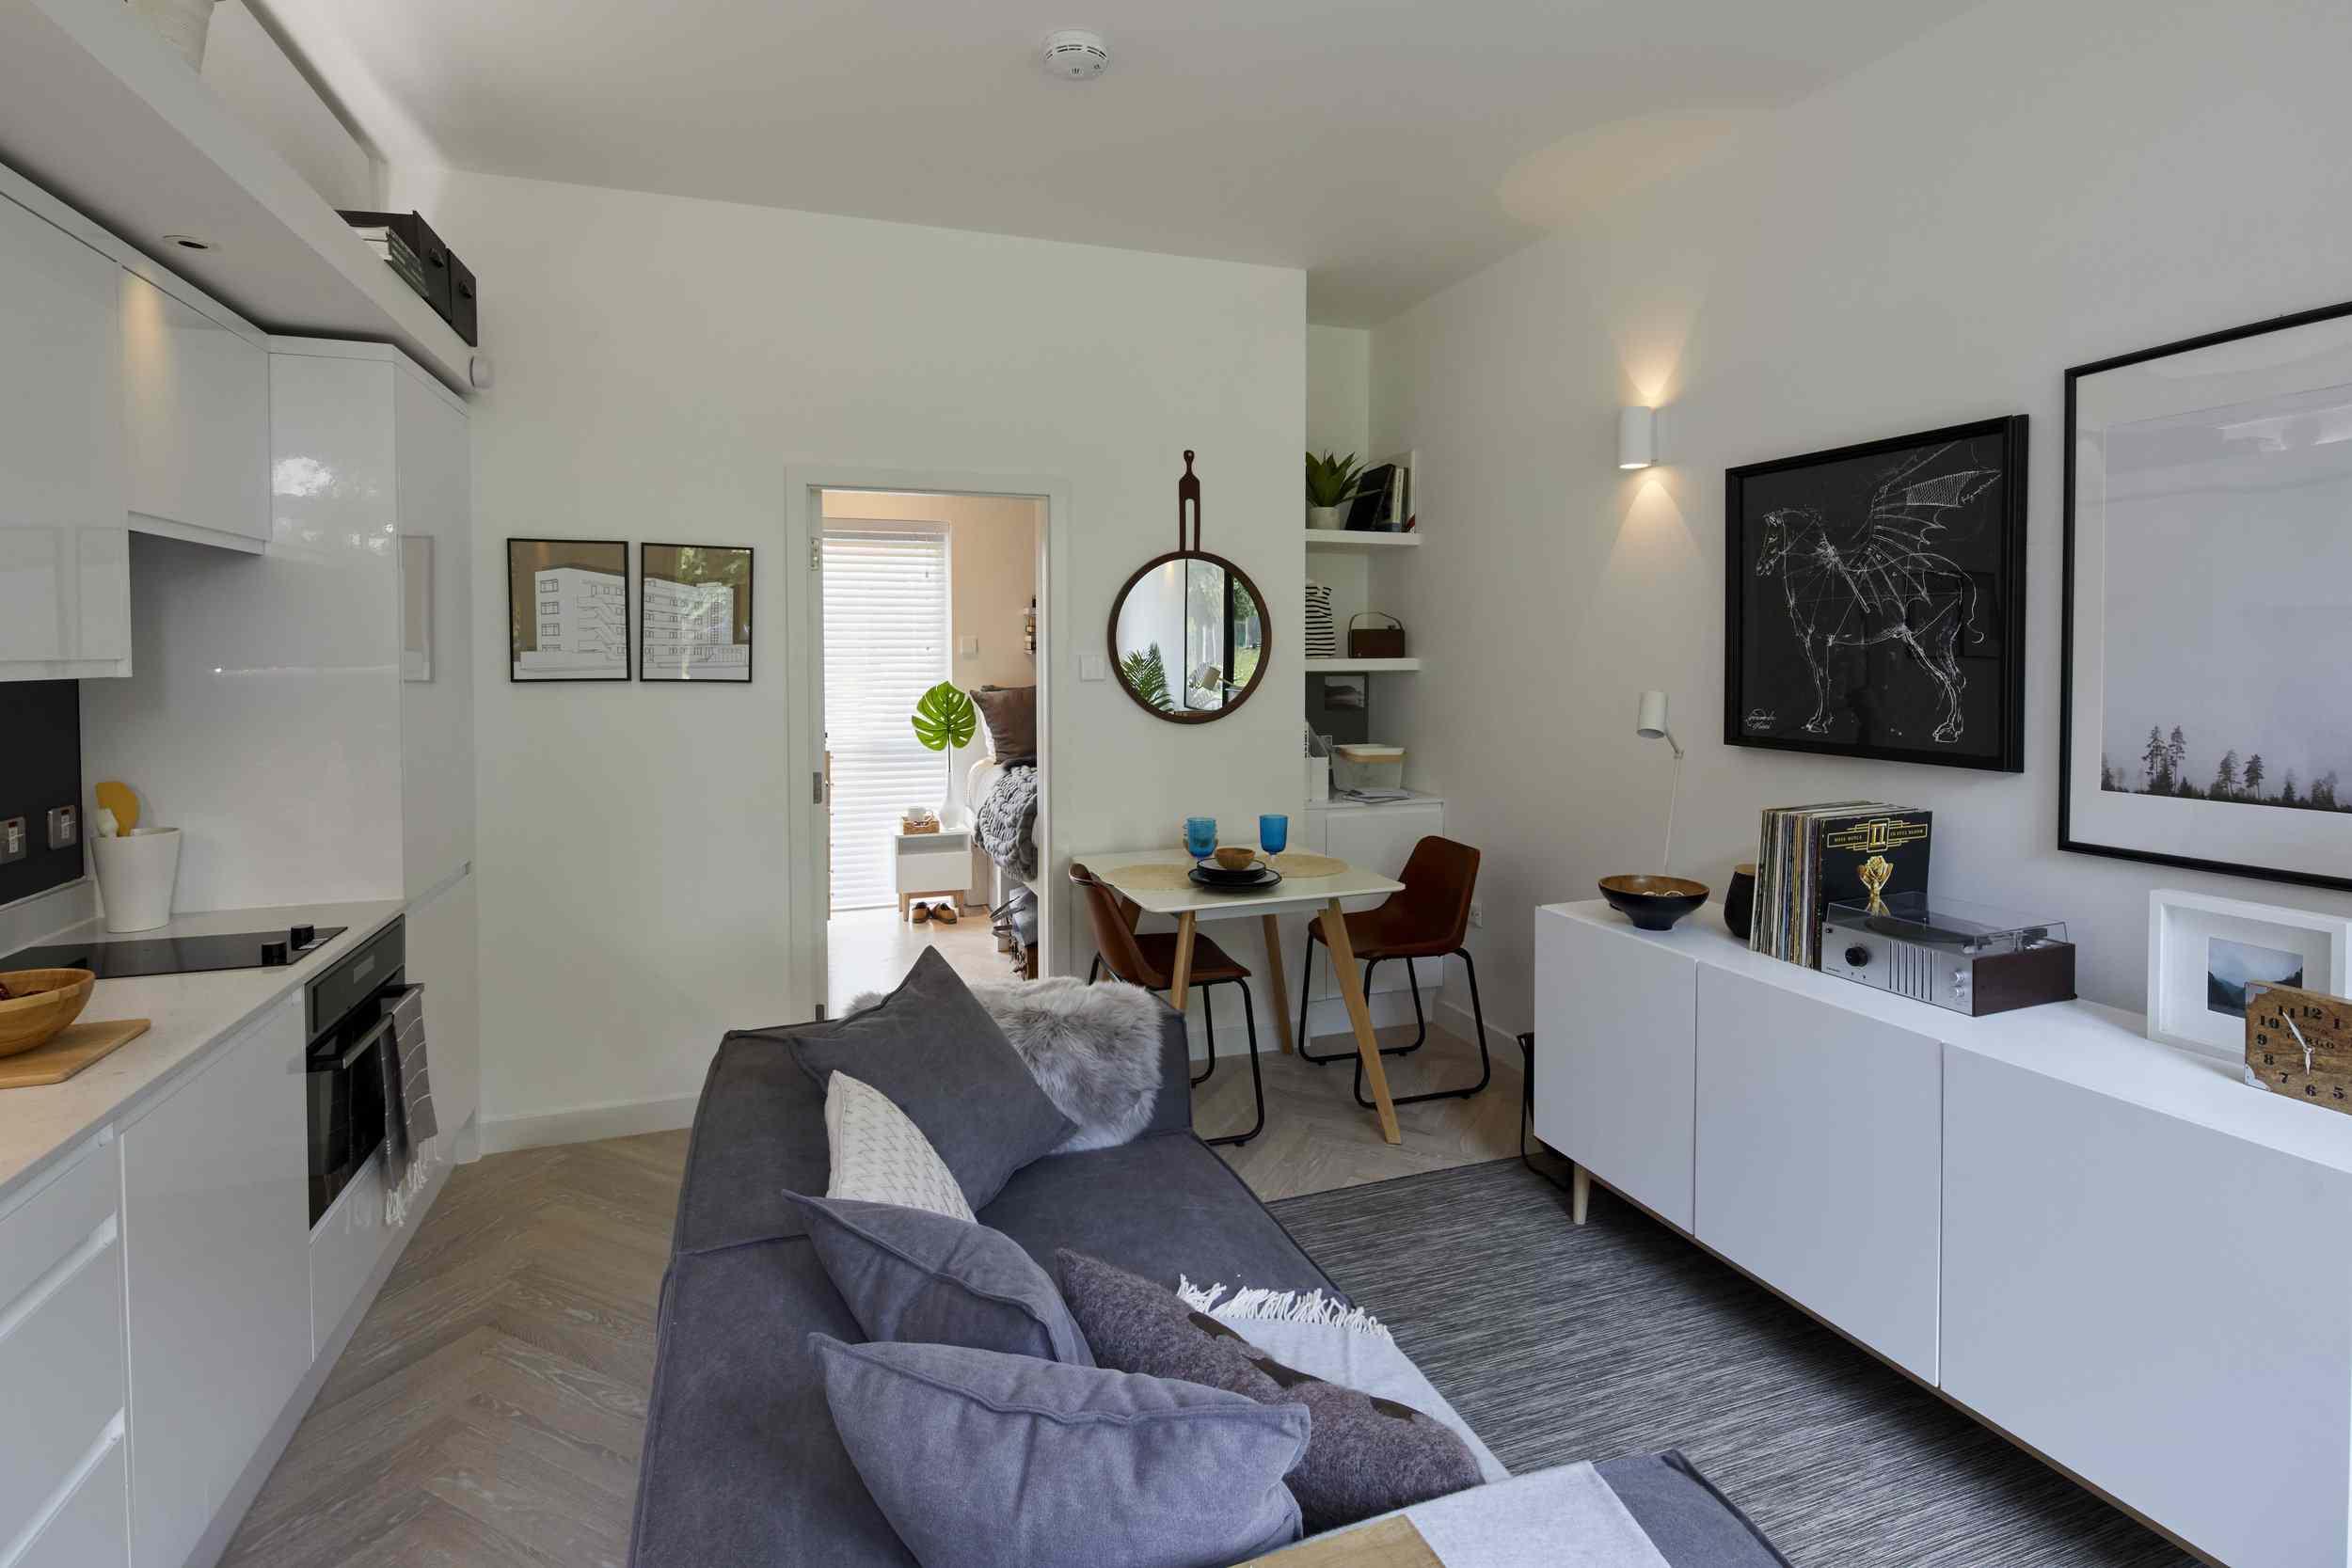 Living room looking to bedroom